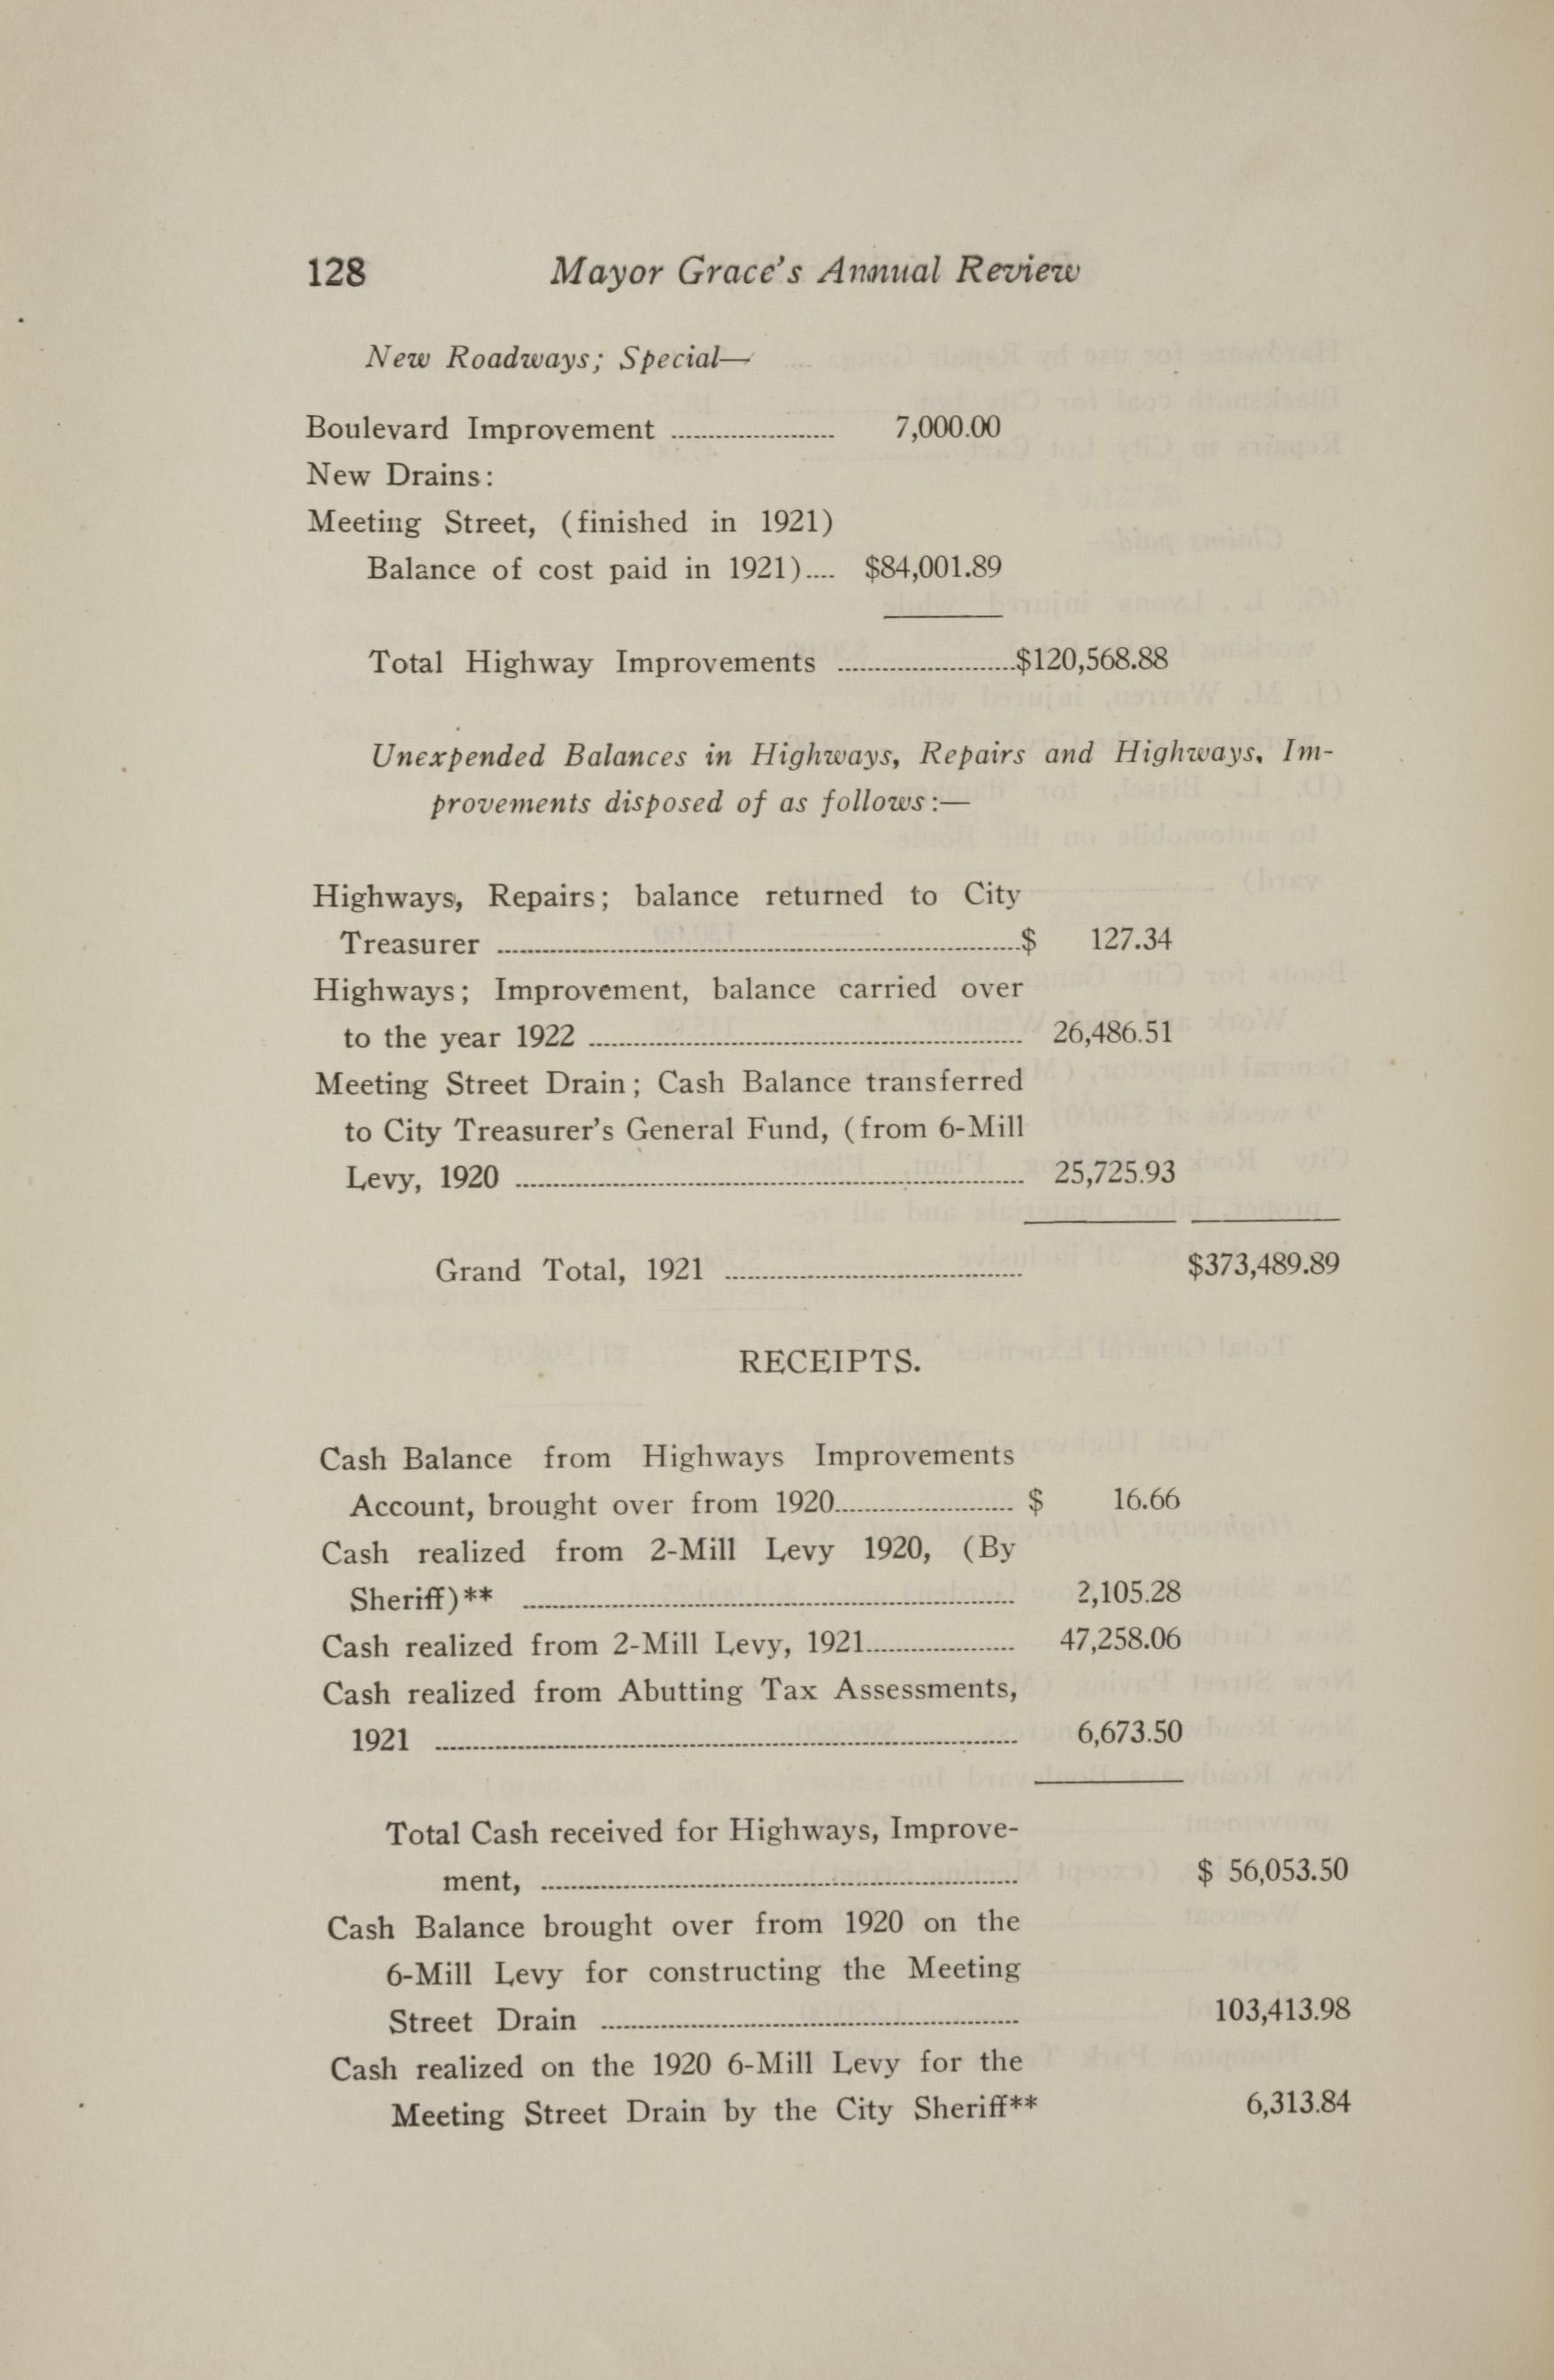 Charleston Yearbook, 1921, page 128